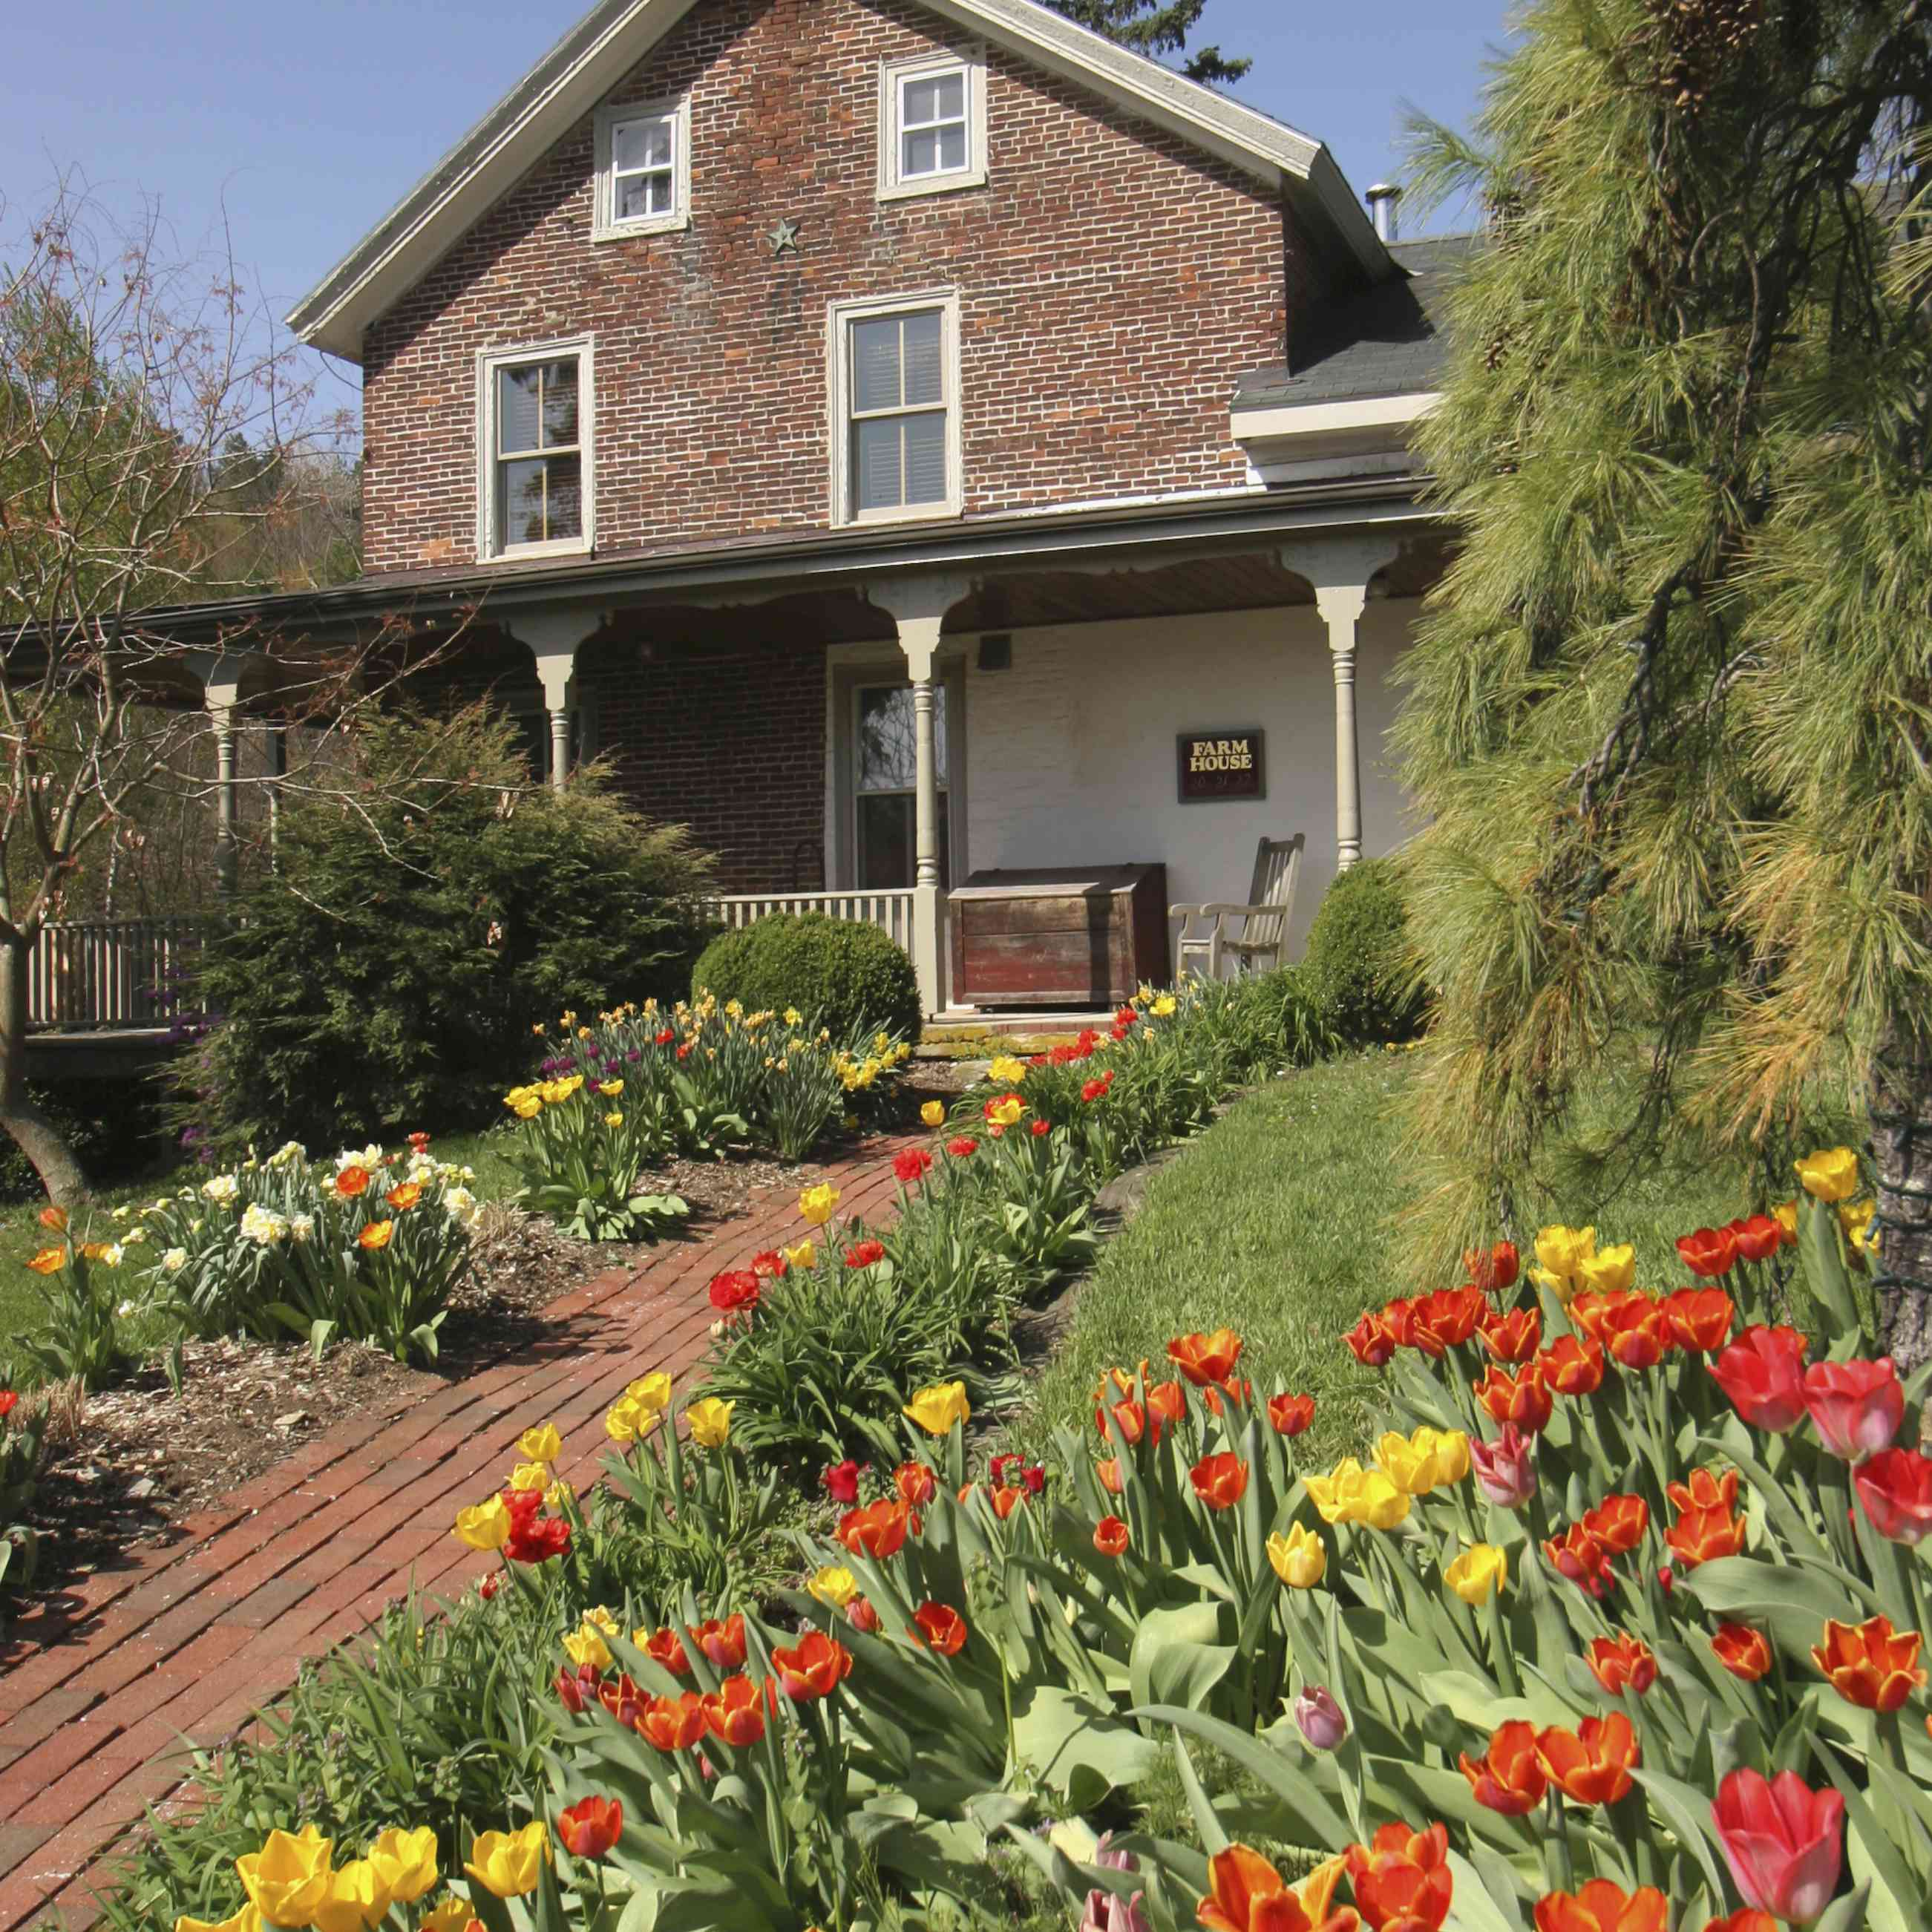 Farmhouse in Pennsylvania